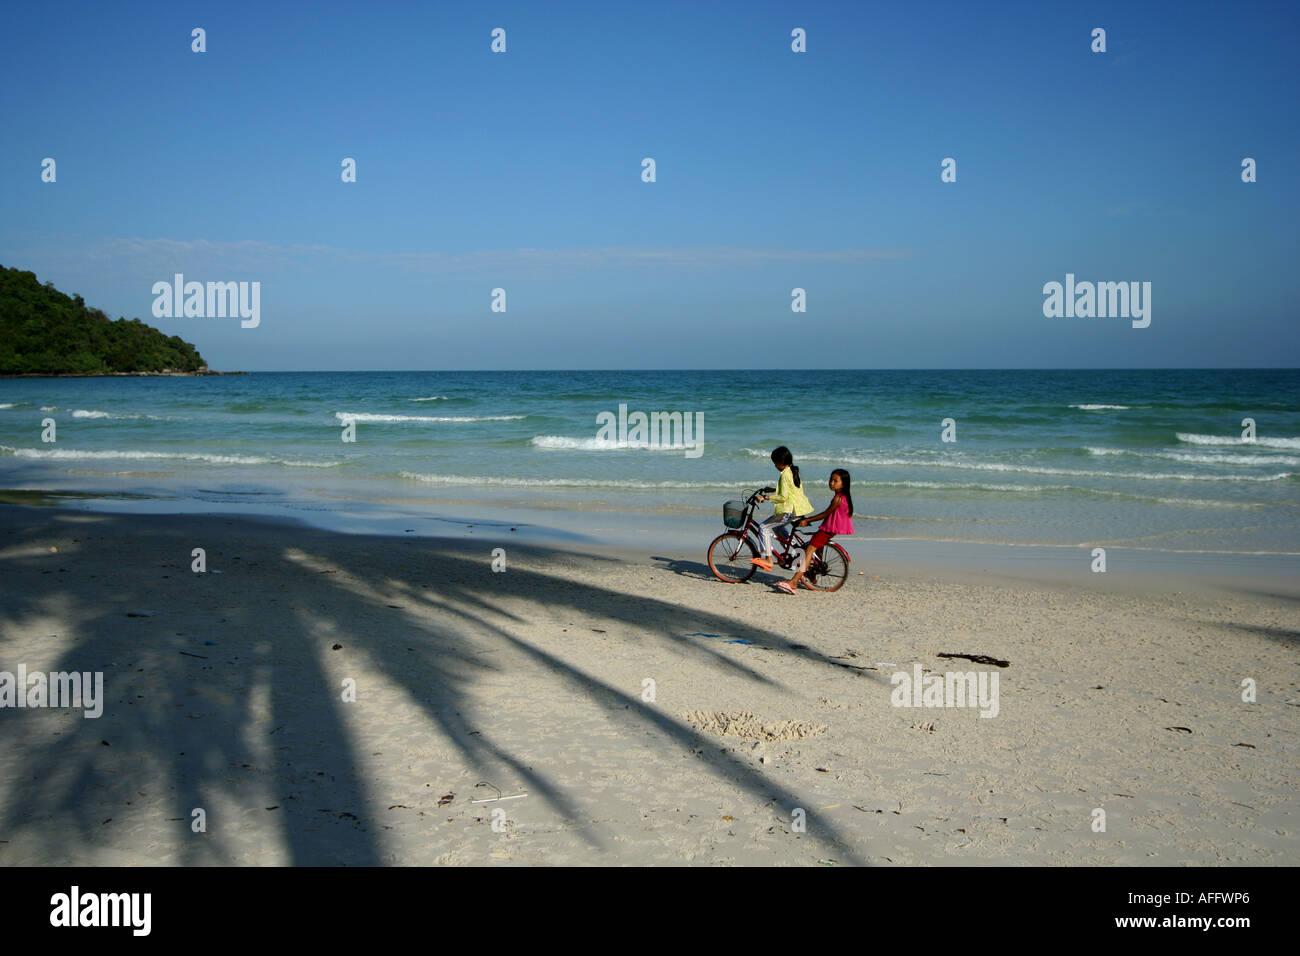 Sao Beach, Phu Quoc - Stock Image